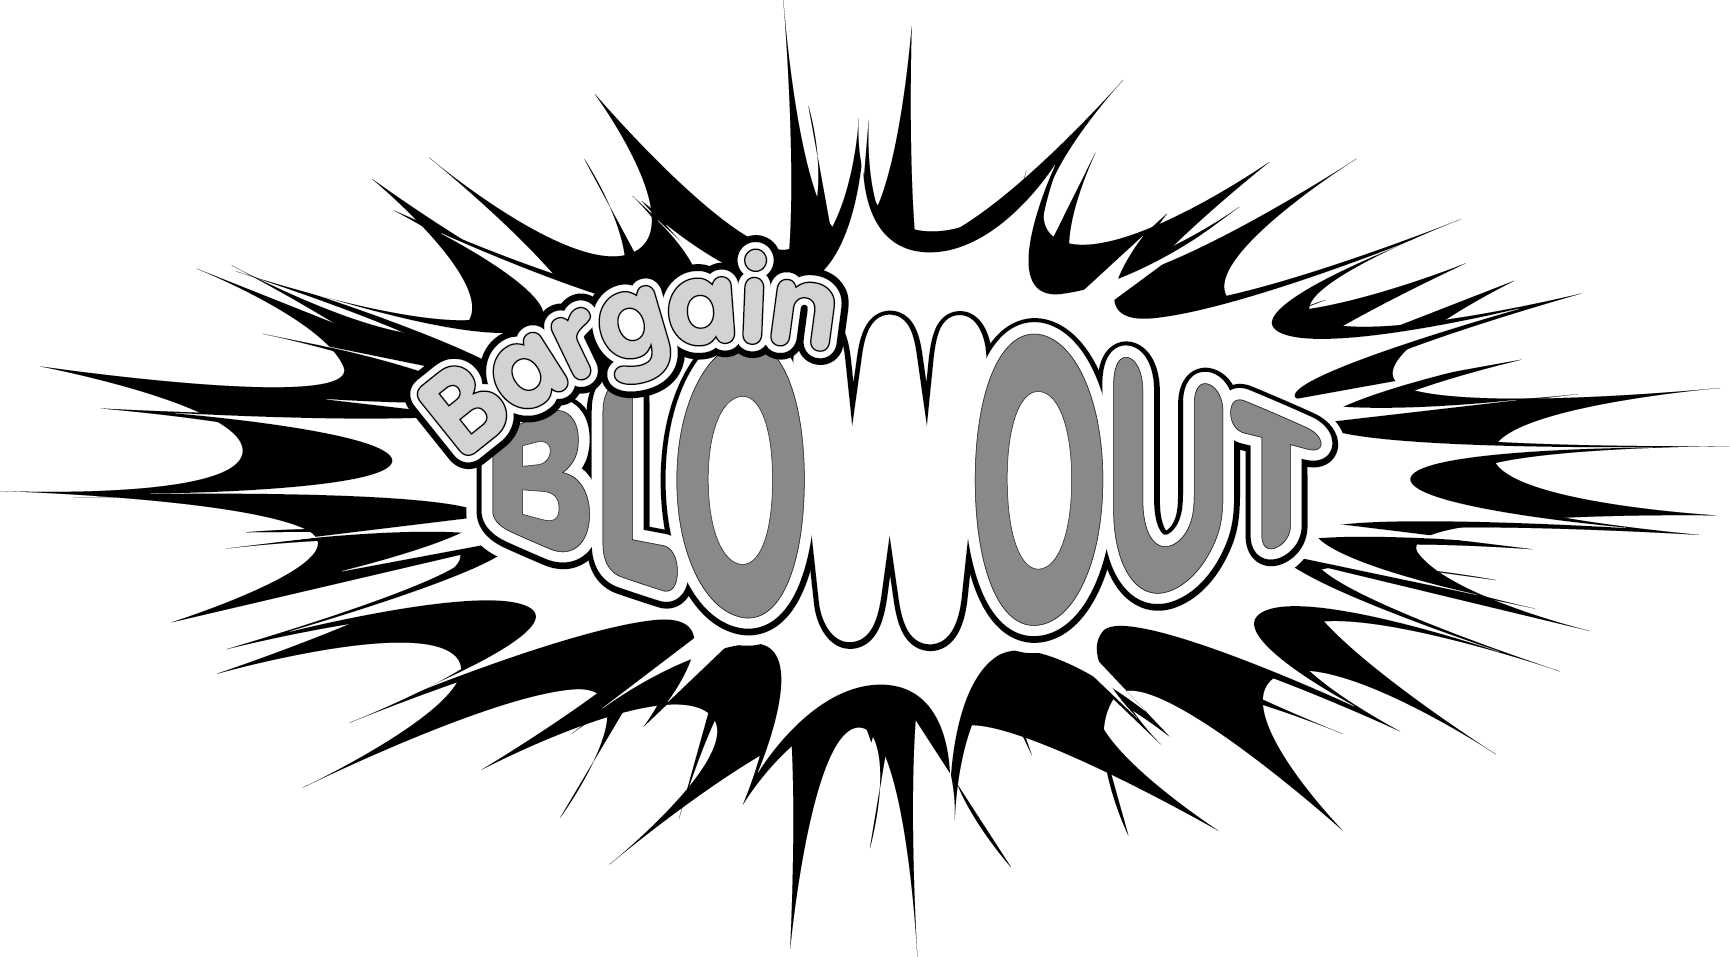 Label clip art irregular. Clipart explosion price tag